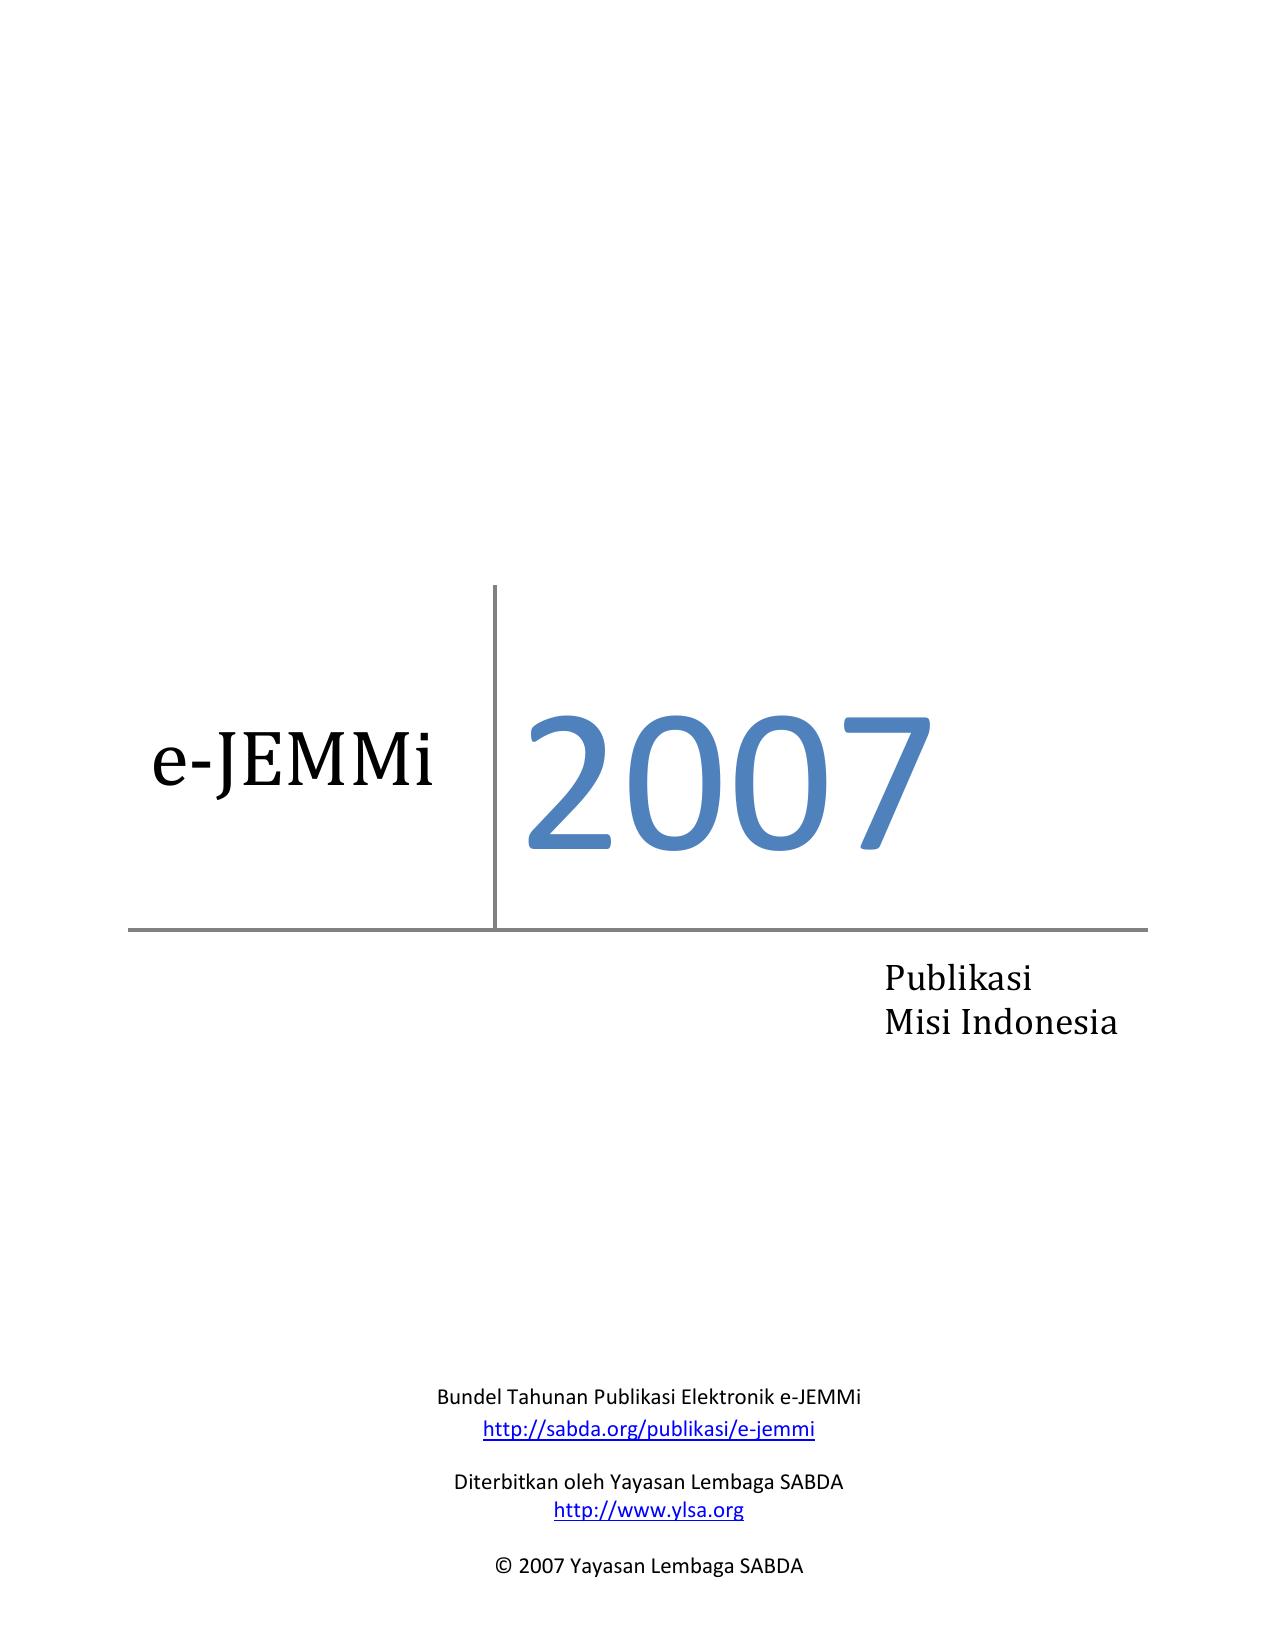 E Jemmi 2007 Sabda Celana Bahan Remaja By Dik Ary Collection Bdg